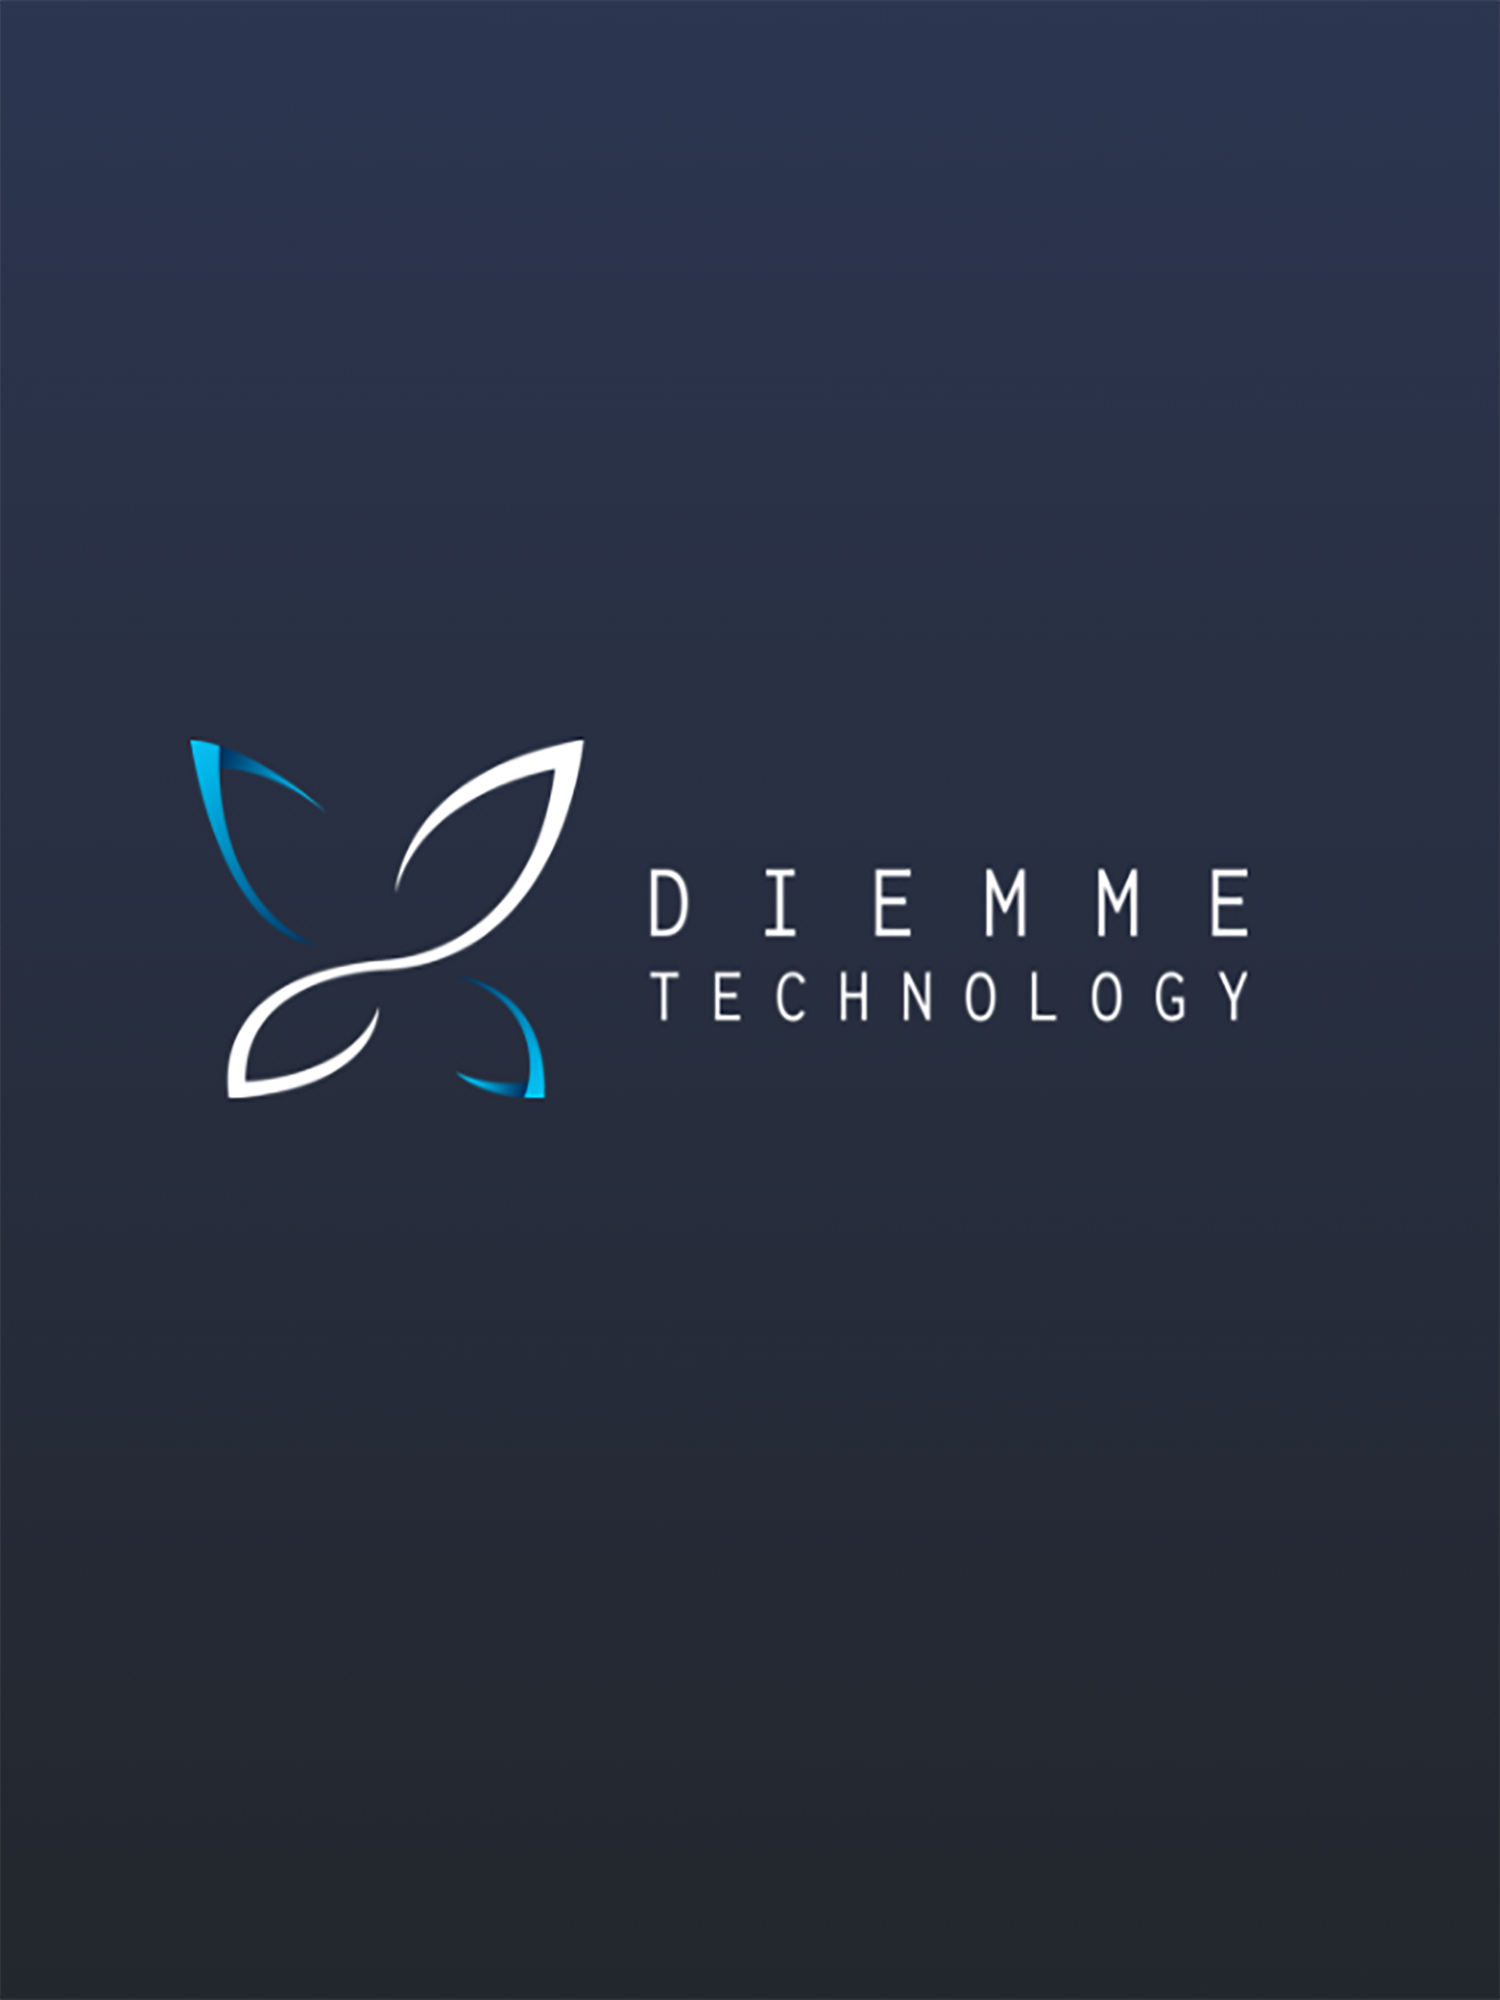 Diemme-Technology-Industria 4.0